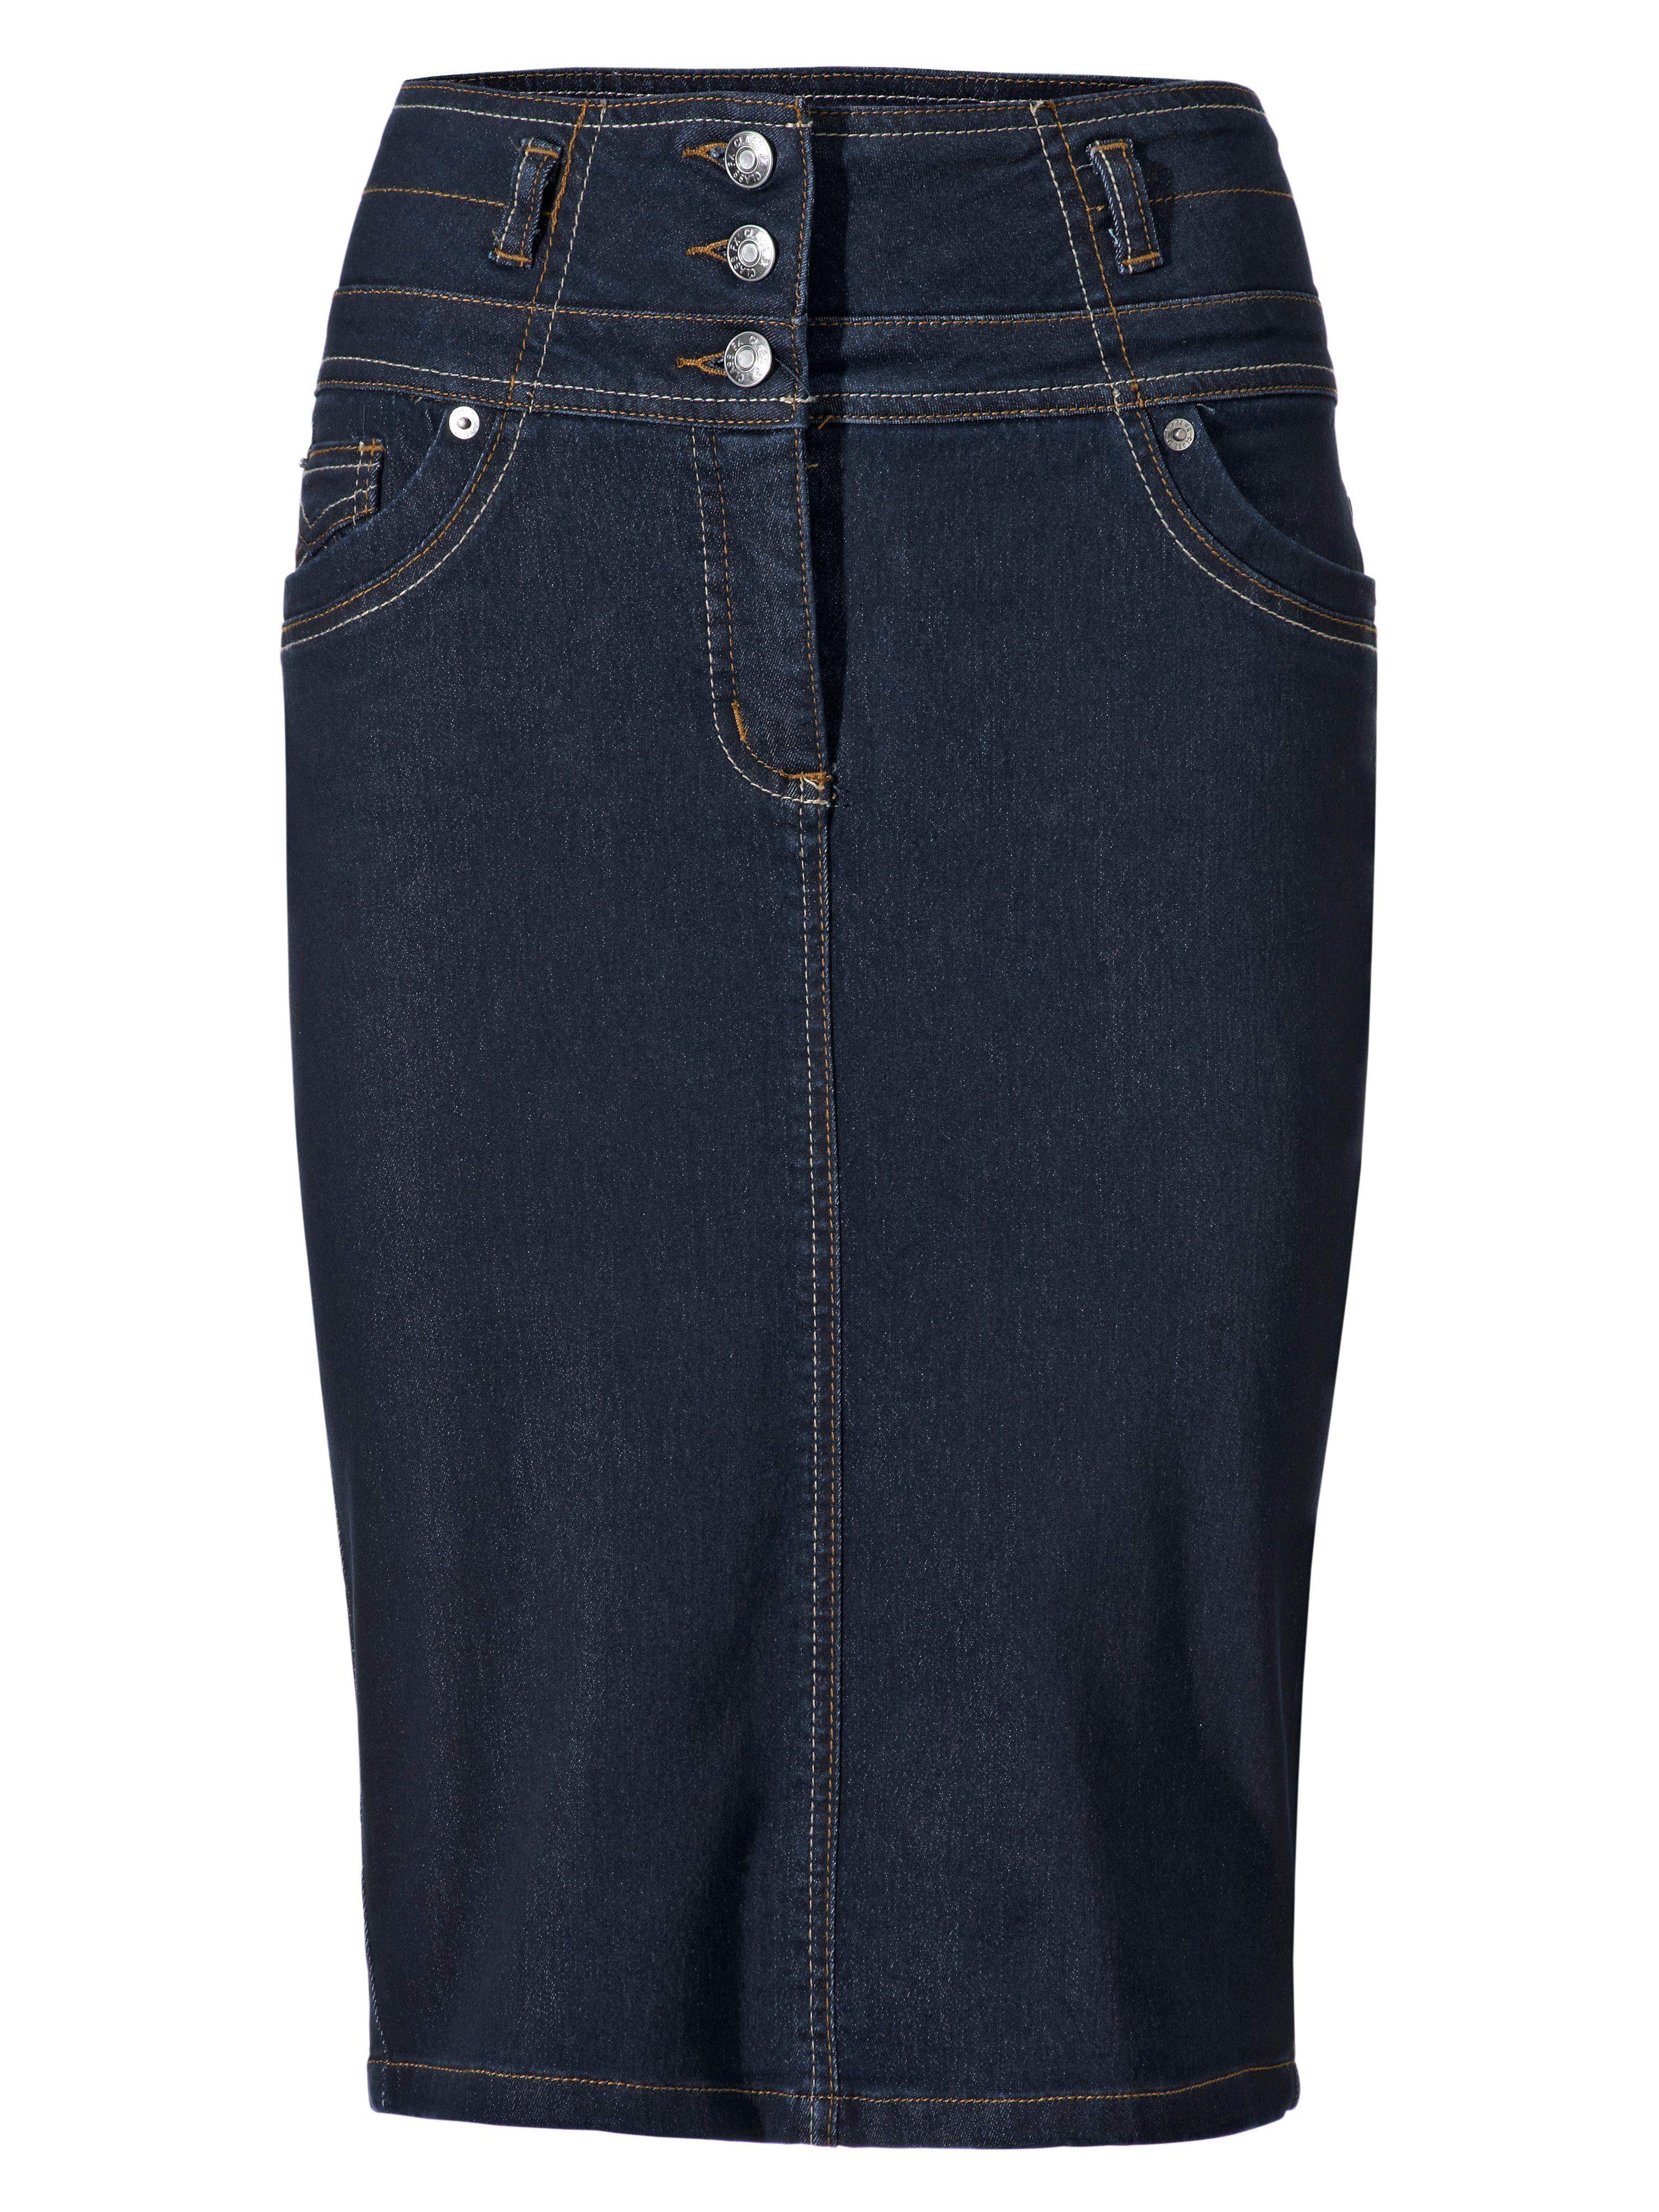 34-46 Blue Heine Jeans Rock Stiefelrock Gr NEU 992